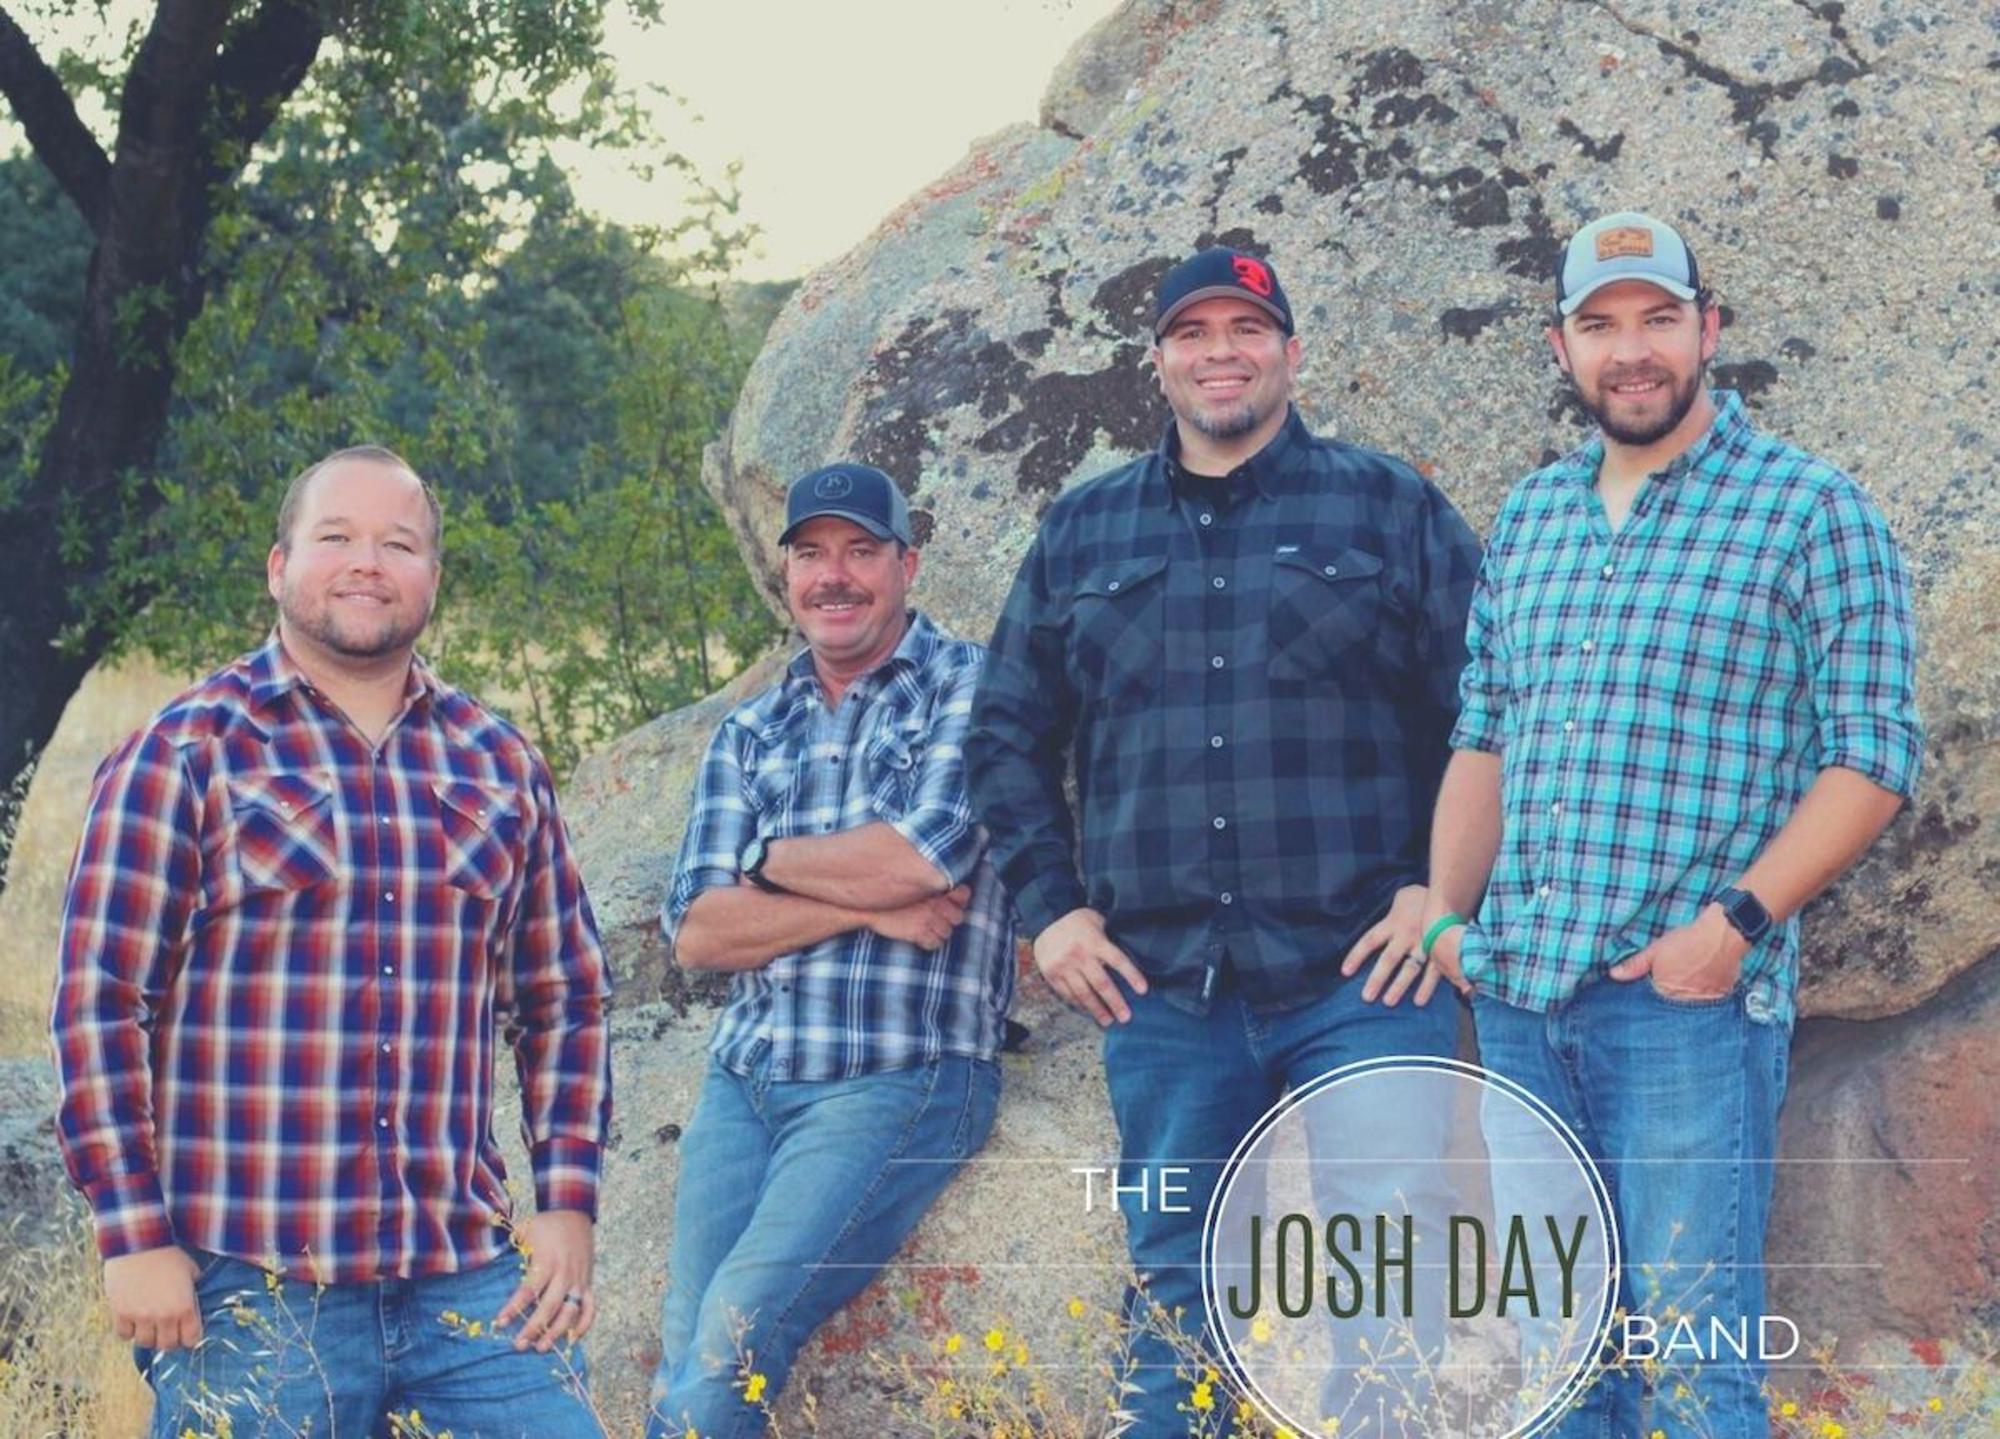 Josh Day Band